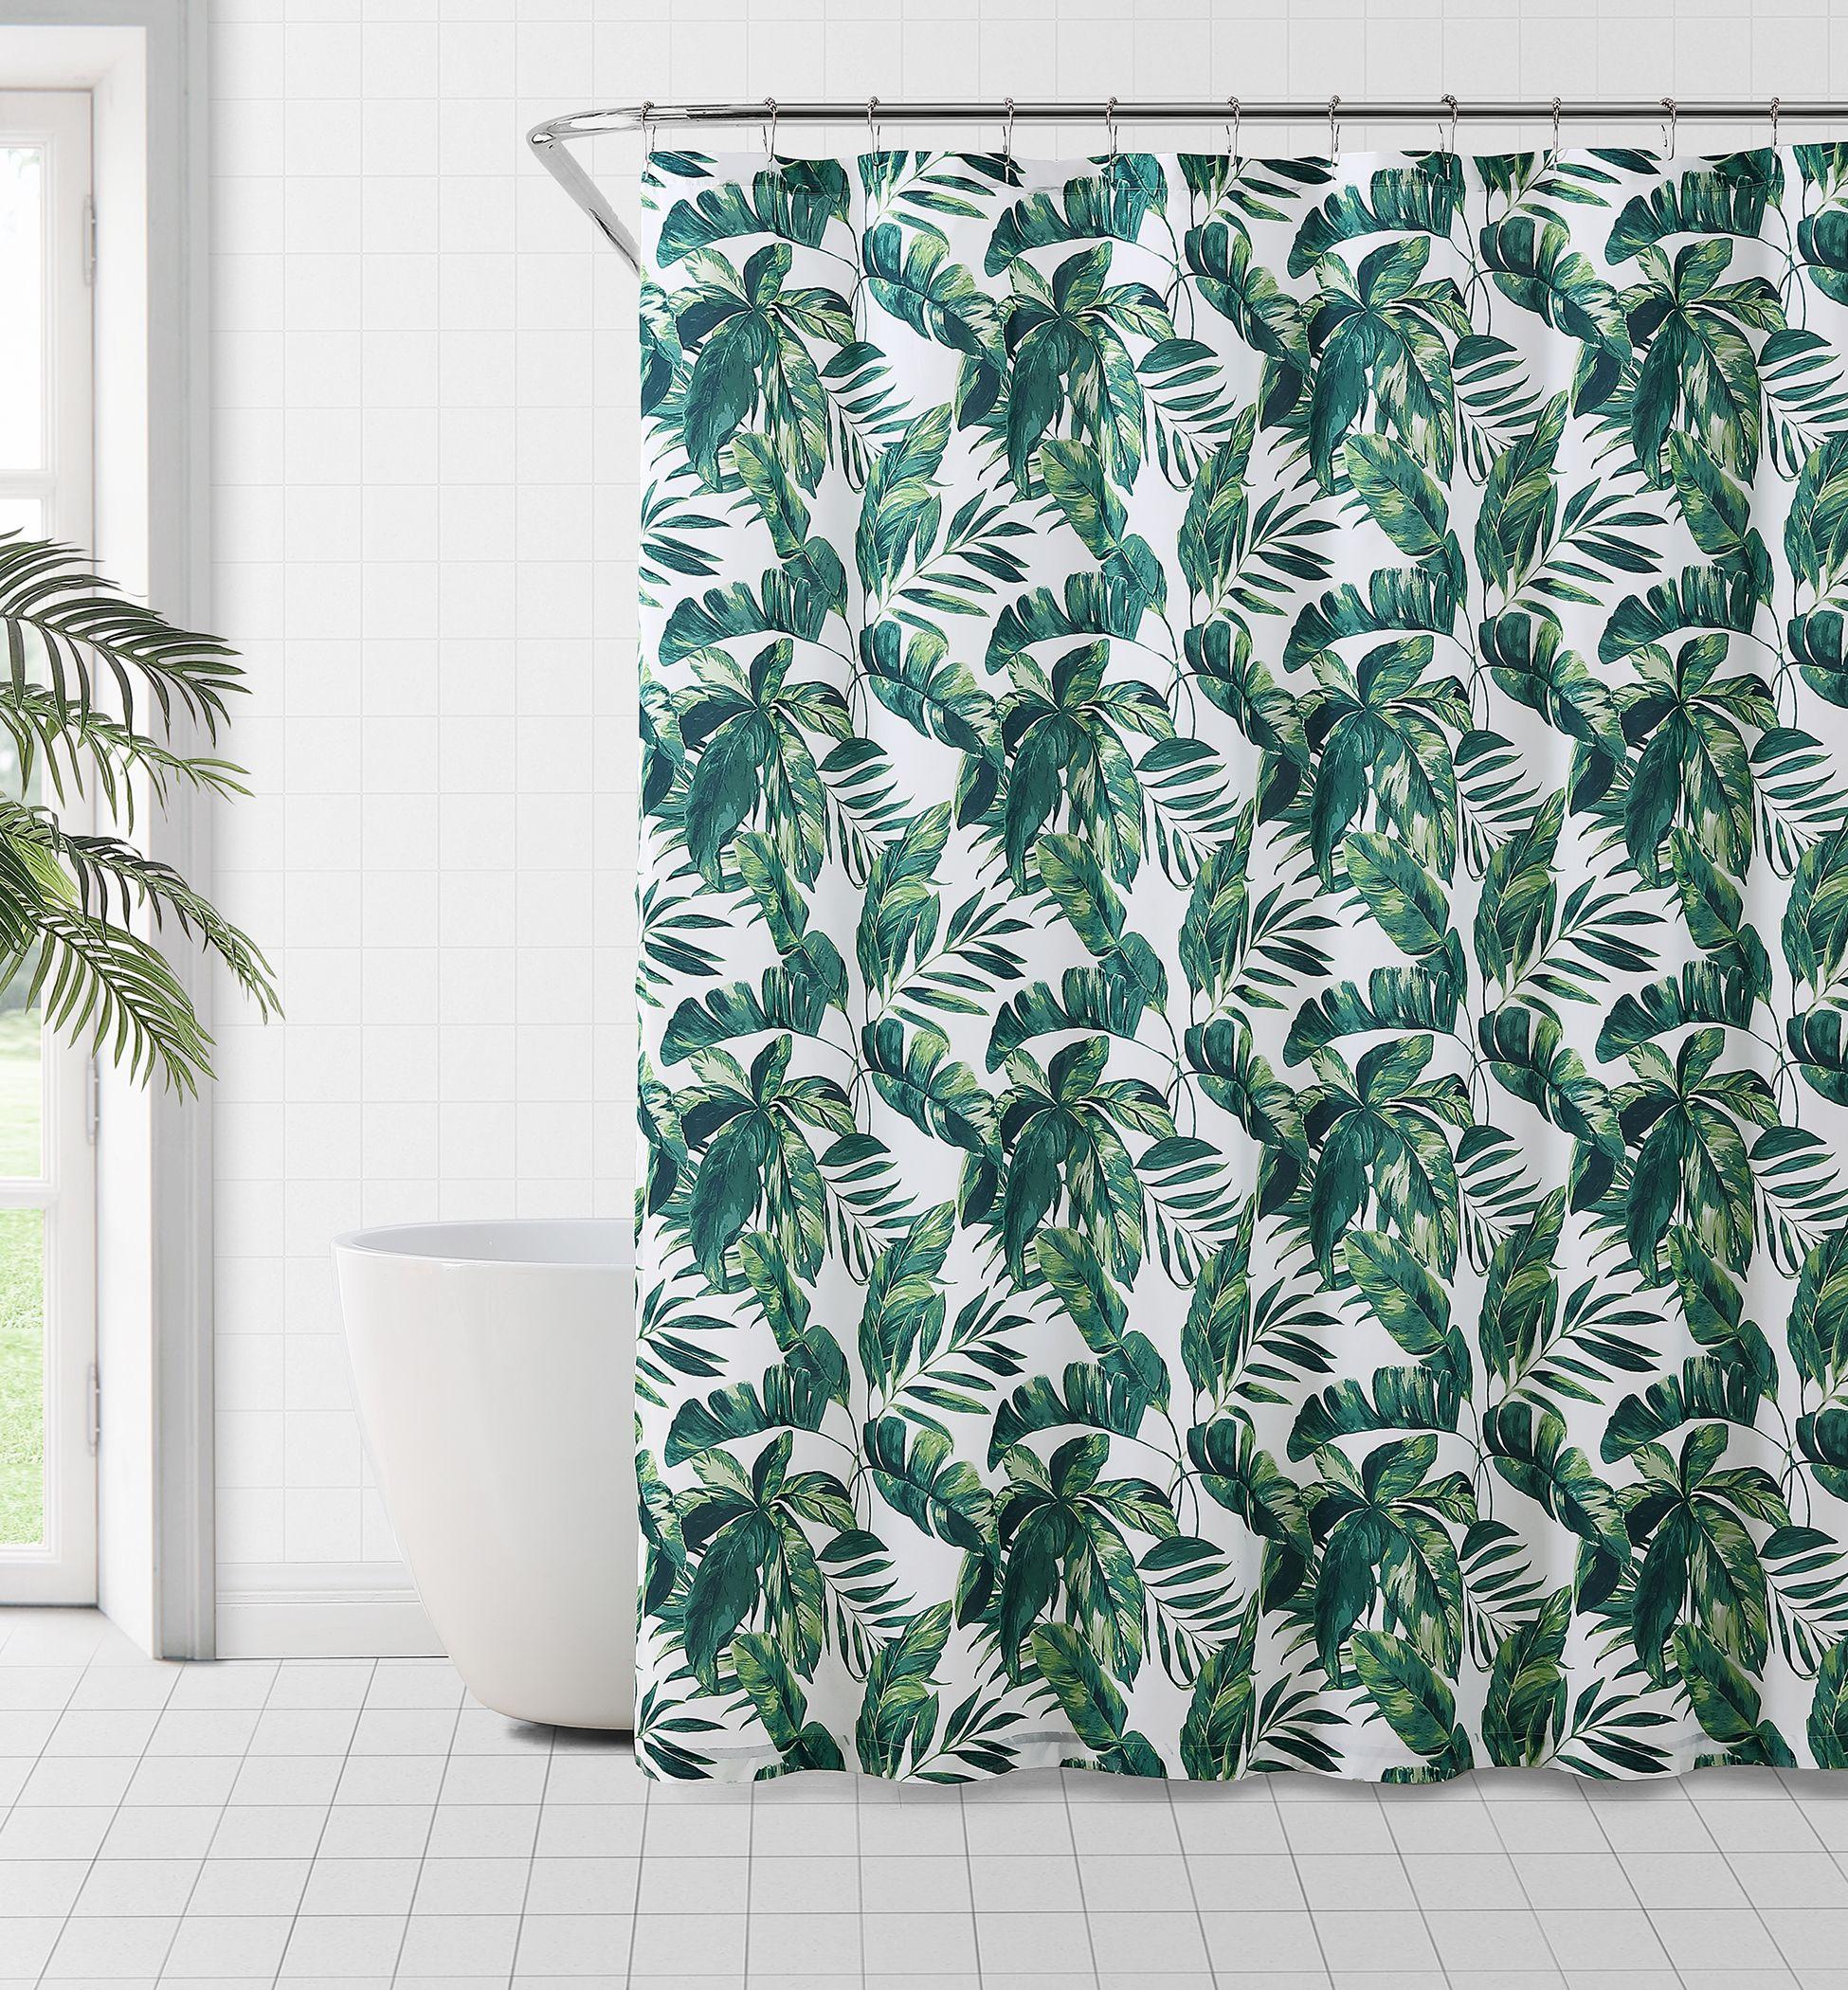 Home Shower Curtains Walmart Cute Shower Curtains Printed